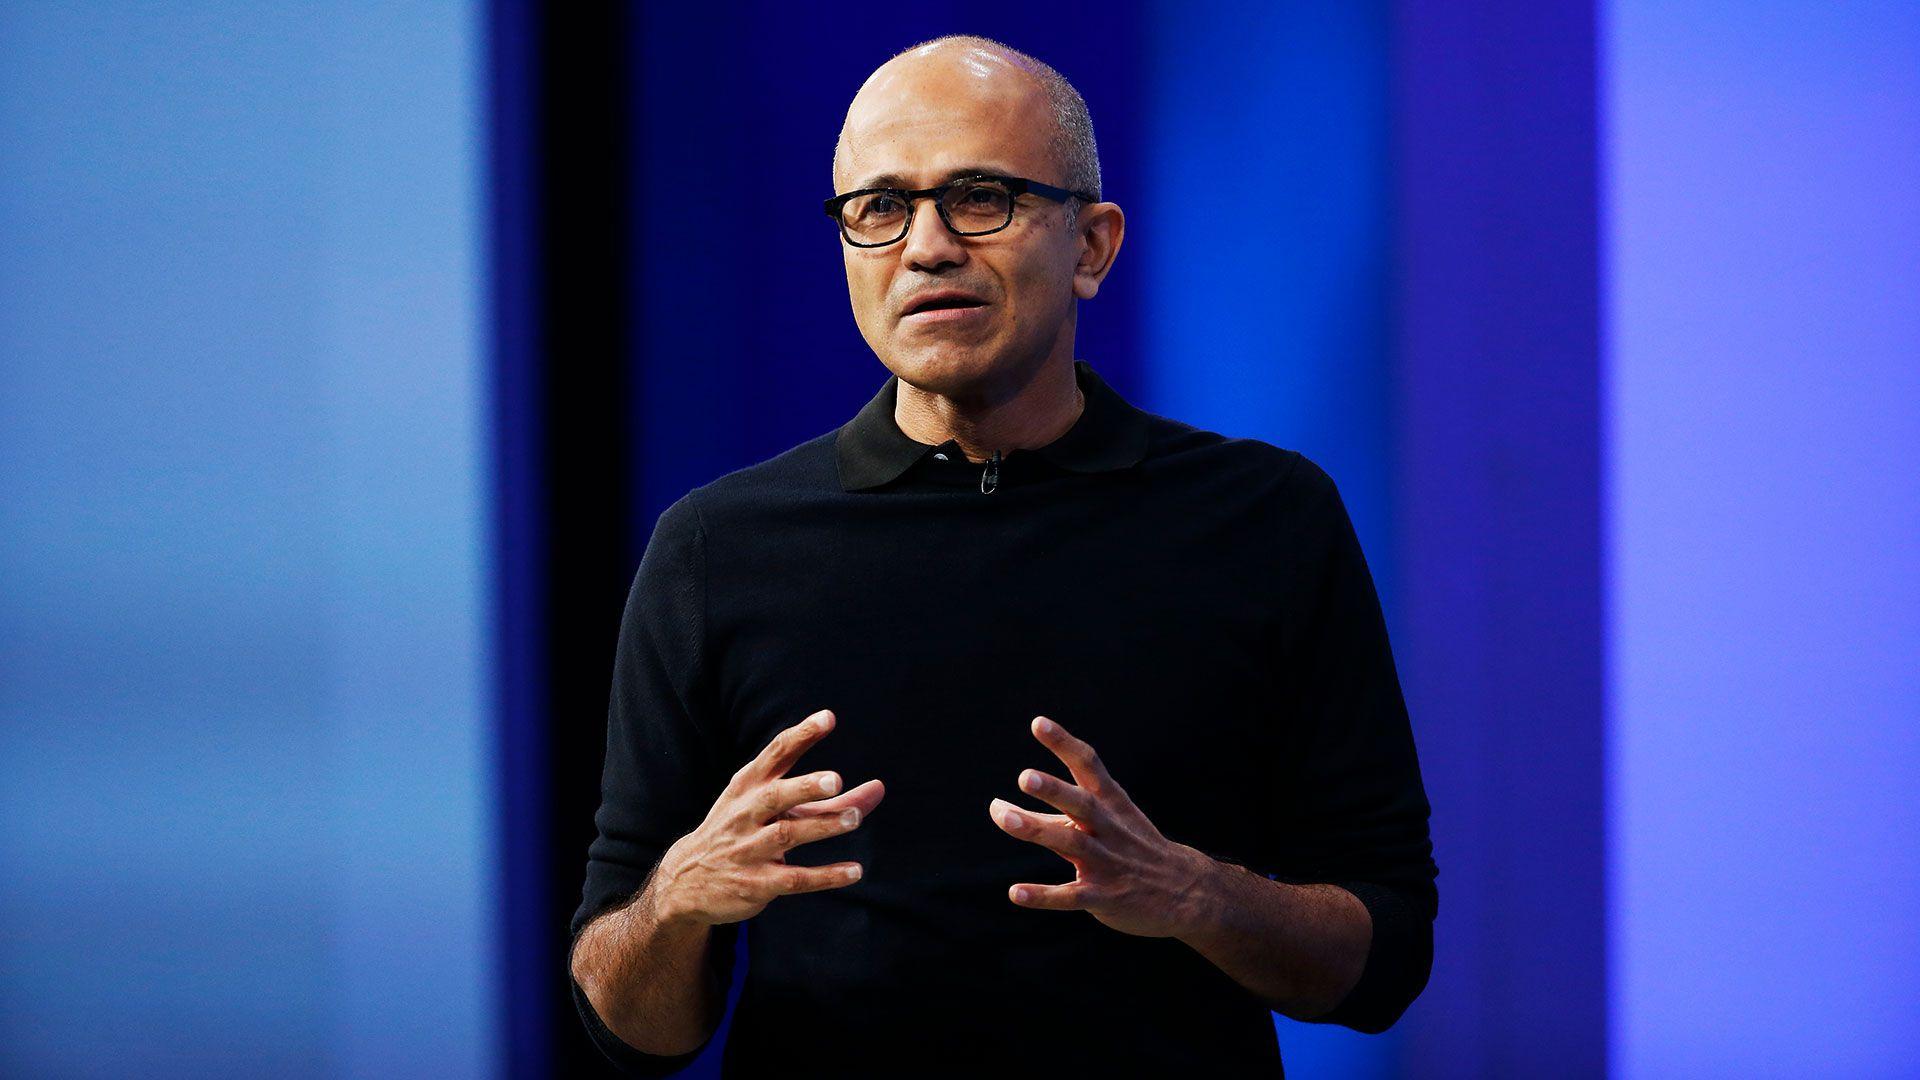 Satya Nadella, CEO de Microsoft (Photo by Stephen Lam/Getty Images)